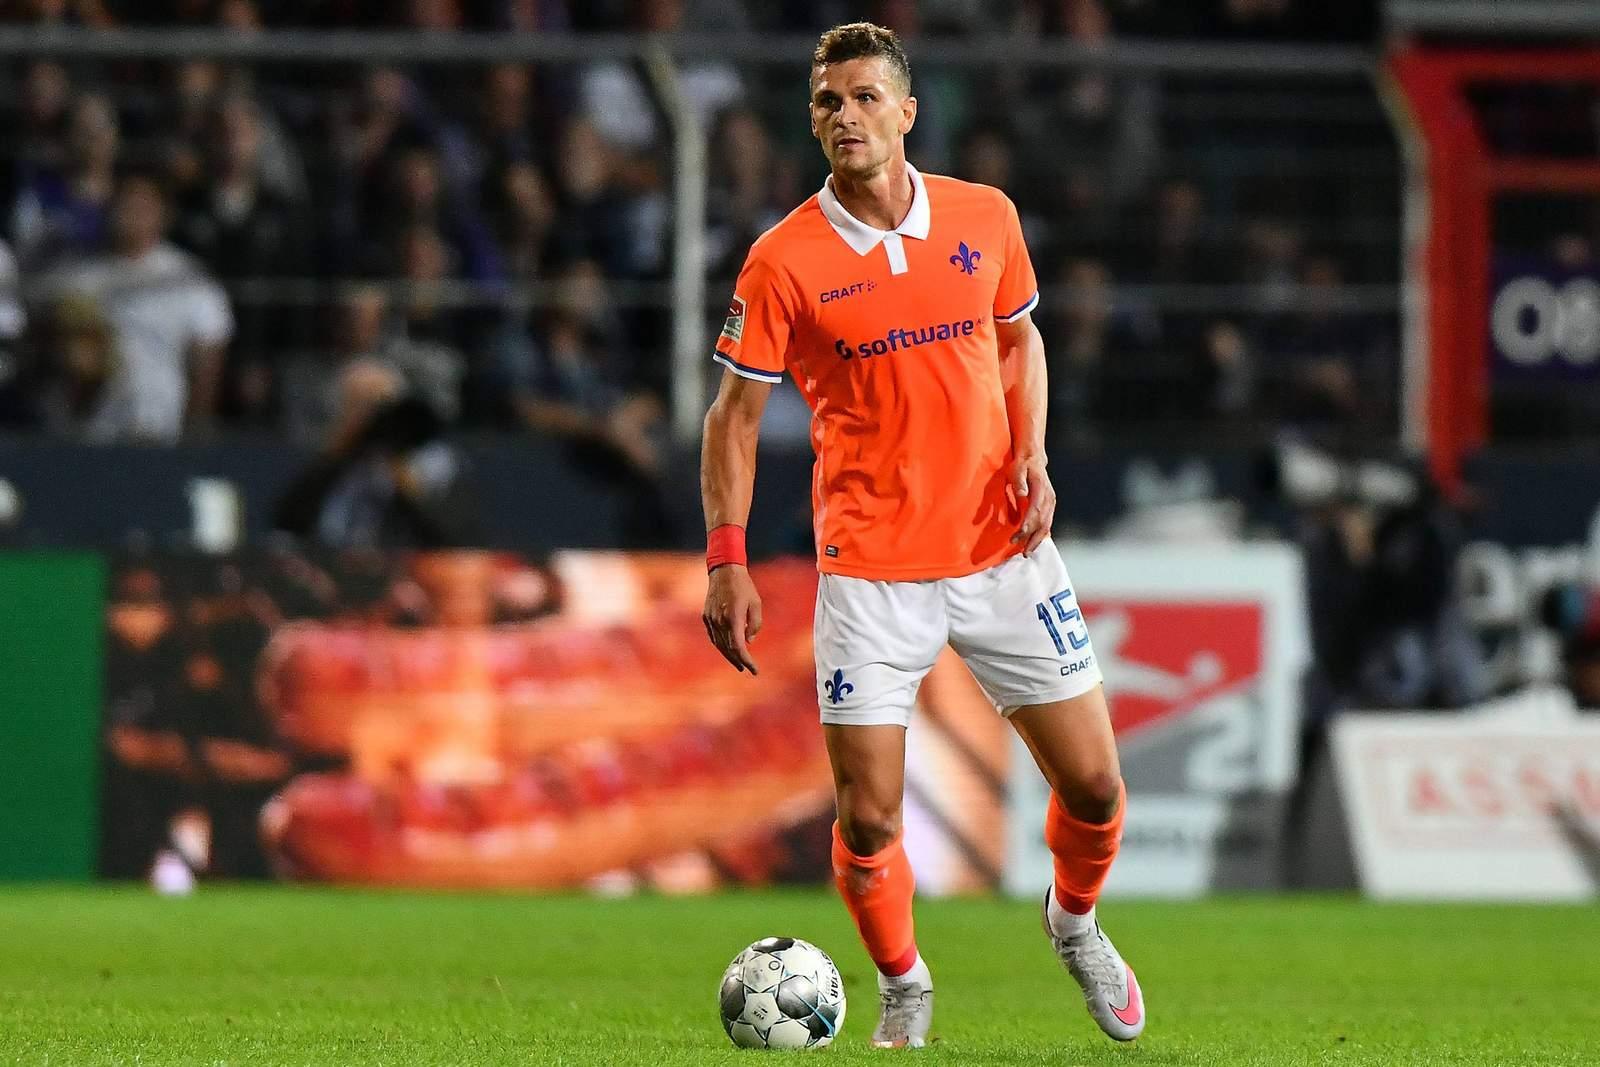 Mathias Wittek im Spiel gegen Osnabrück.